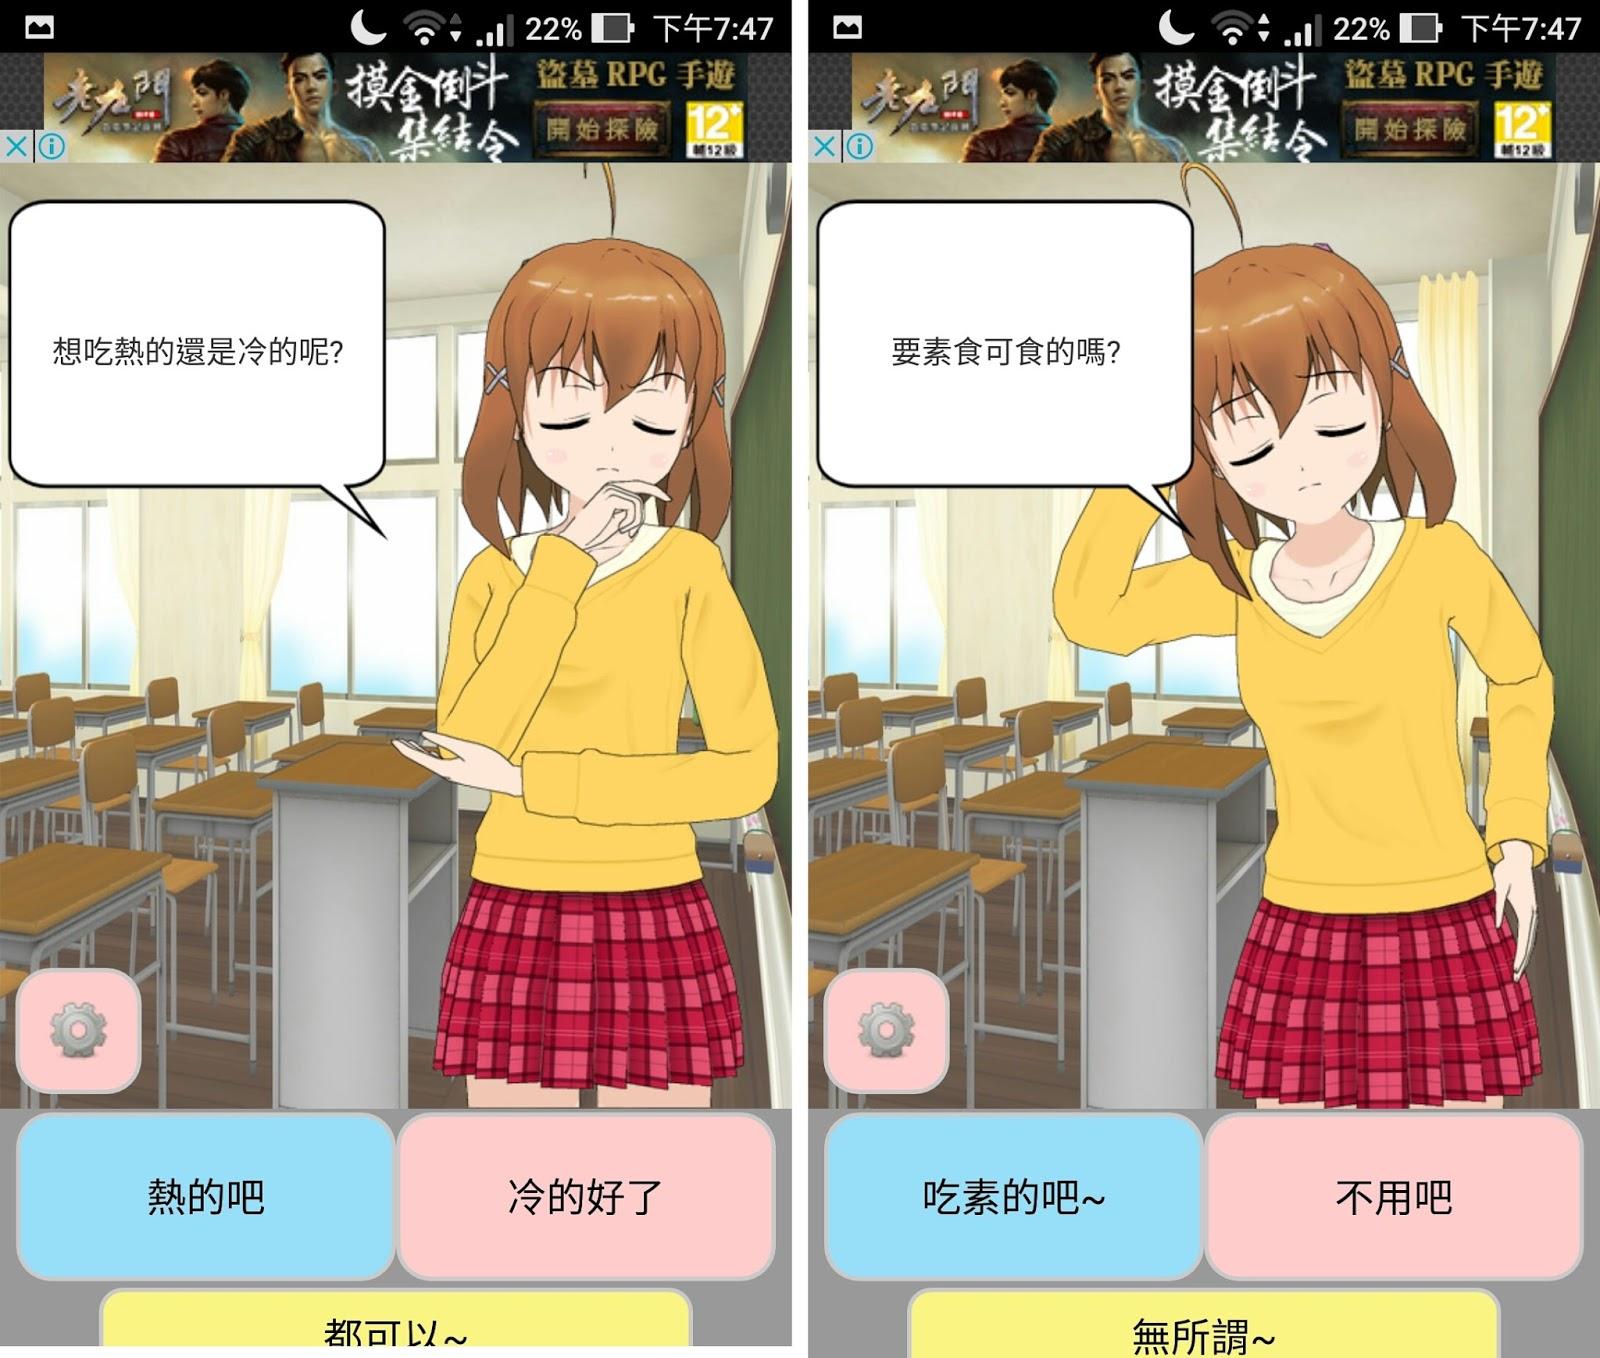 Screenshot 20170422 194703 - 「等下吃什麼?」總是猶豫不決,就讓虛擬女友幫你決定!